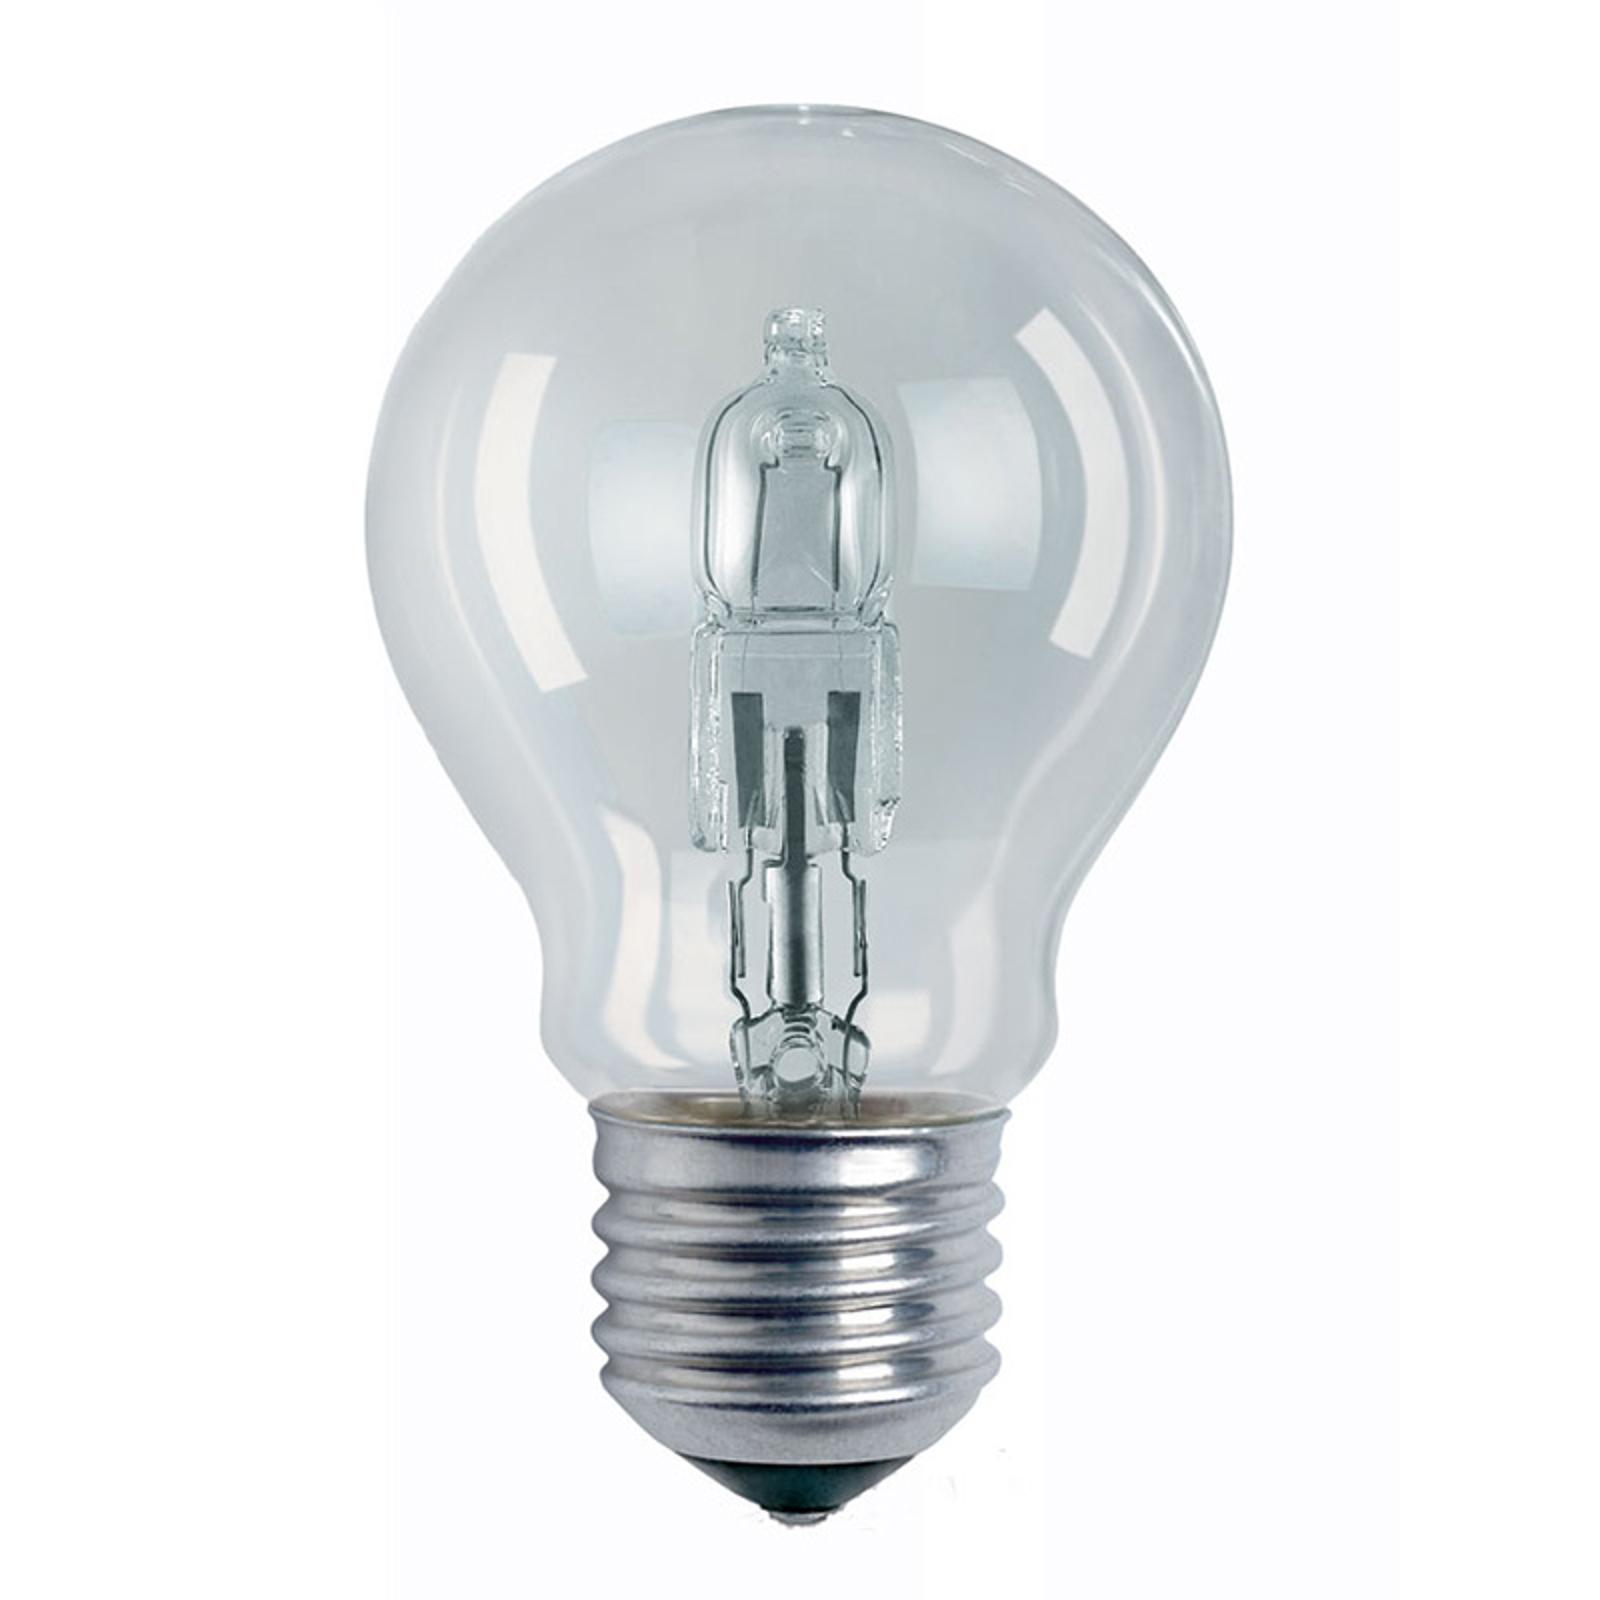 E27 halogen Classic A bulb form clear_7260139_1